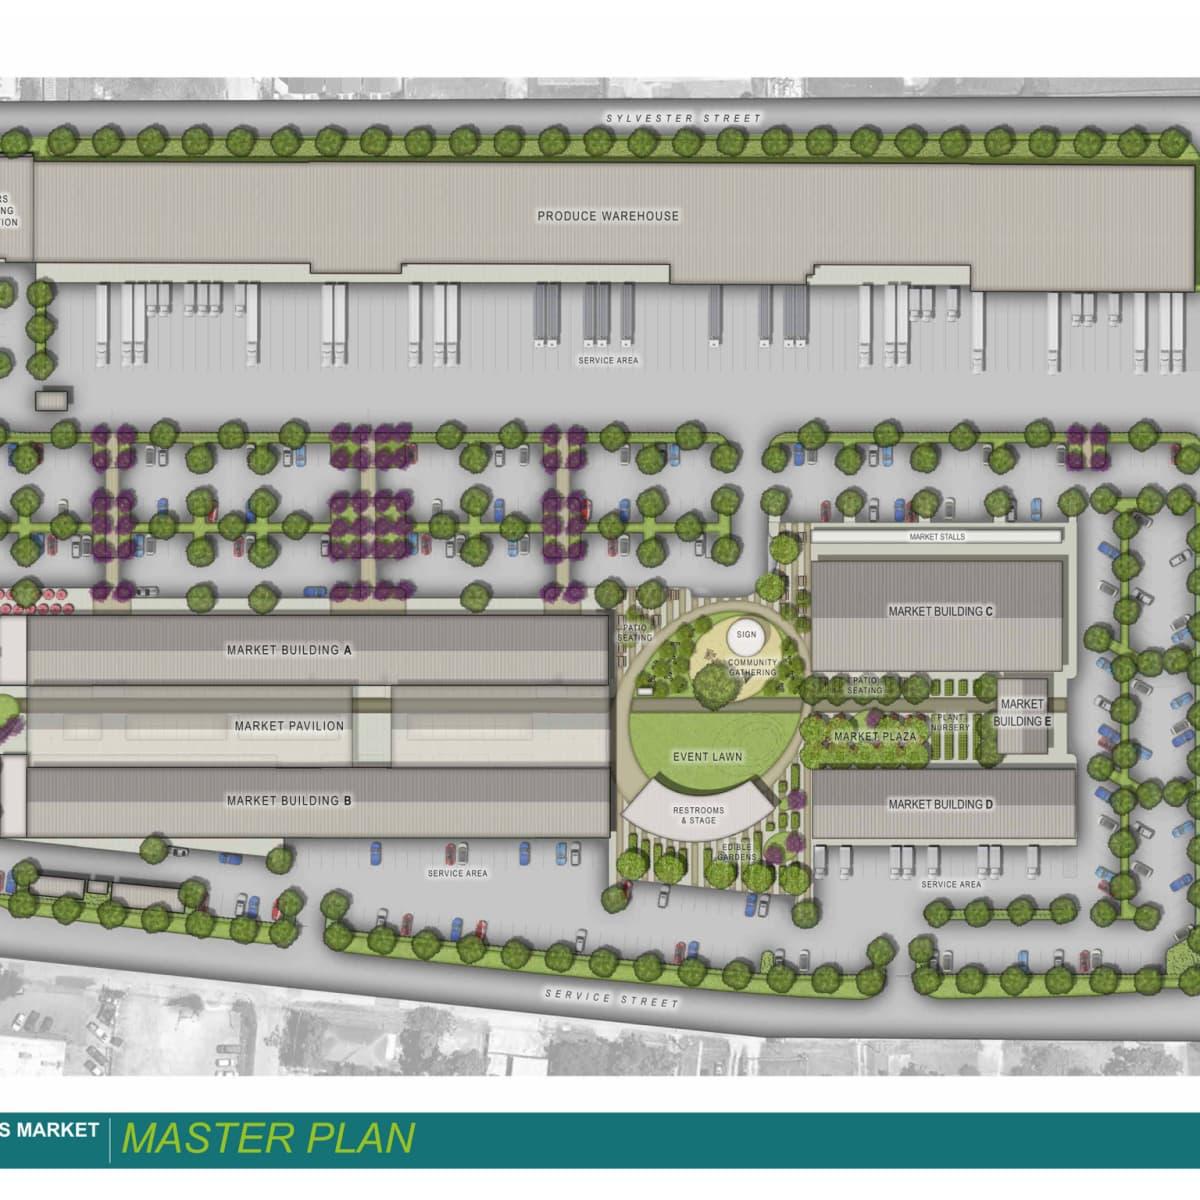 Houston Farmers Market site plan